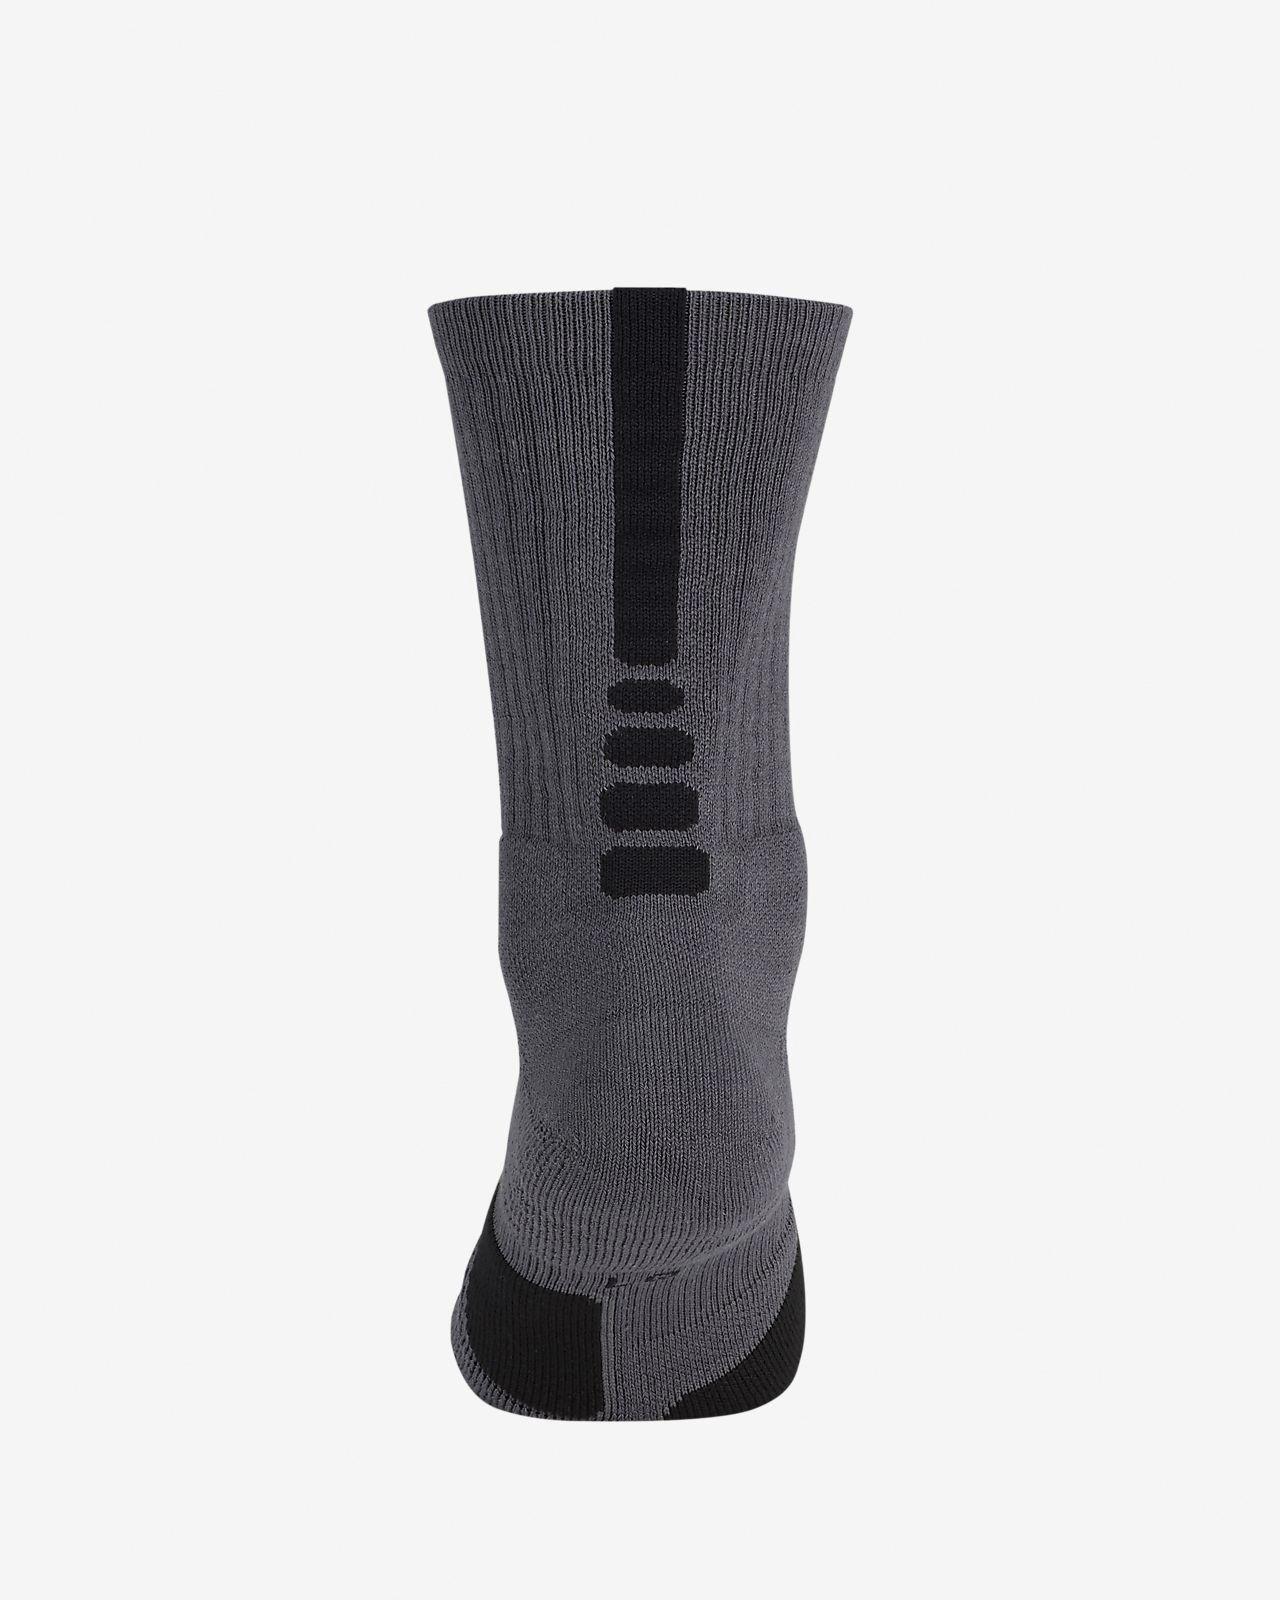 844dabbcdb6cbb Nike Dry Elite 1.5 Crew Basketball Socks - L (W 10-13  M 8-12)   basketballsocks